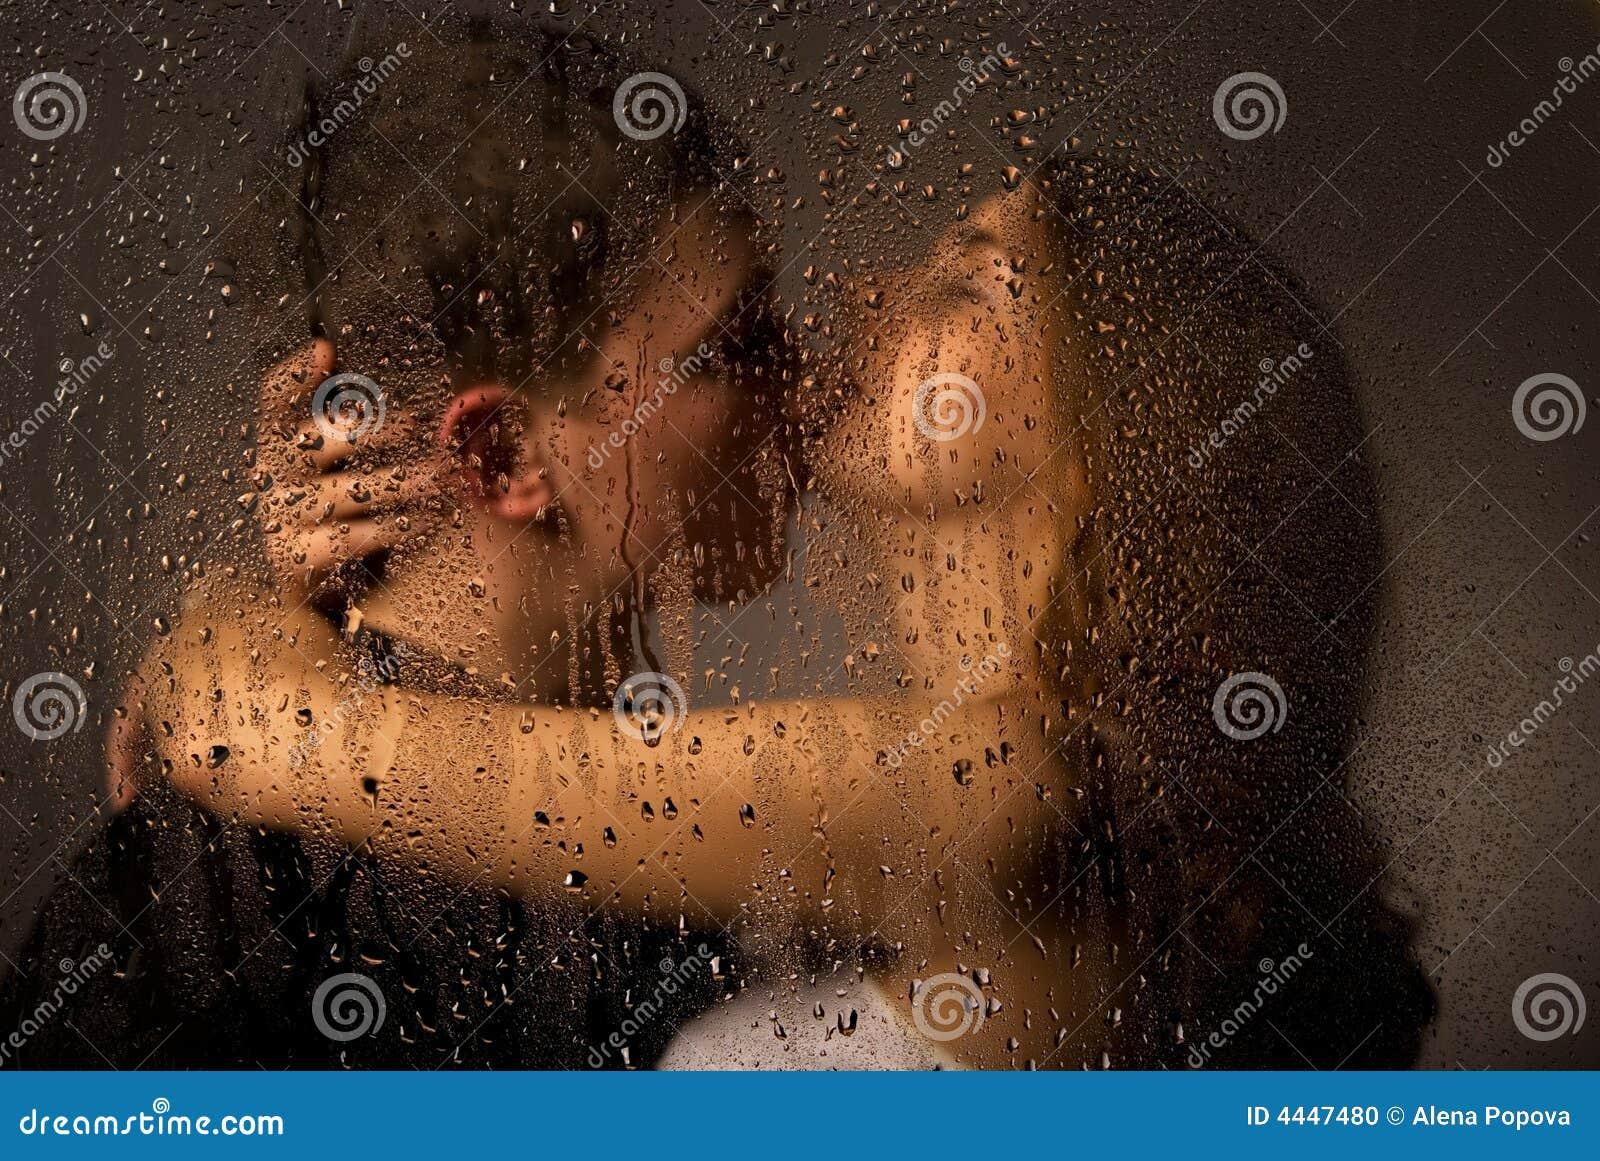 Lovely Kiss Stock Photo Image 4447480